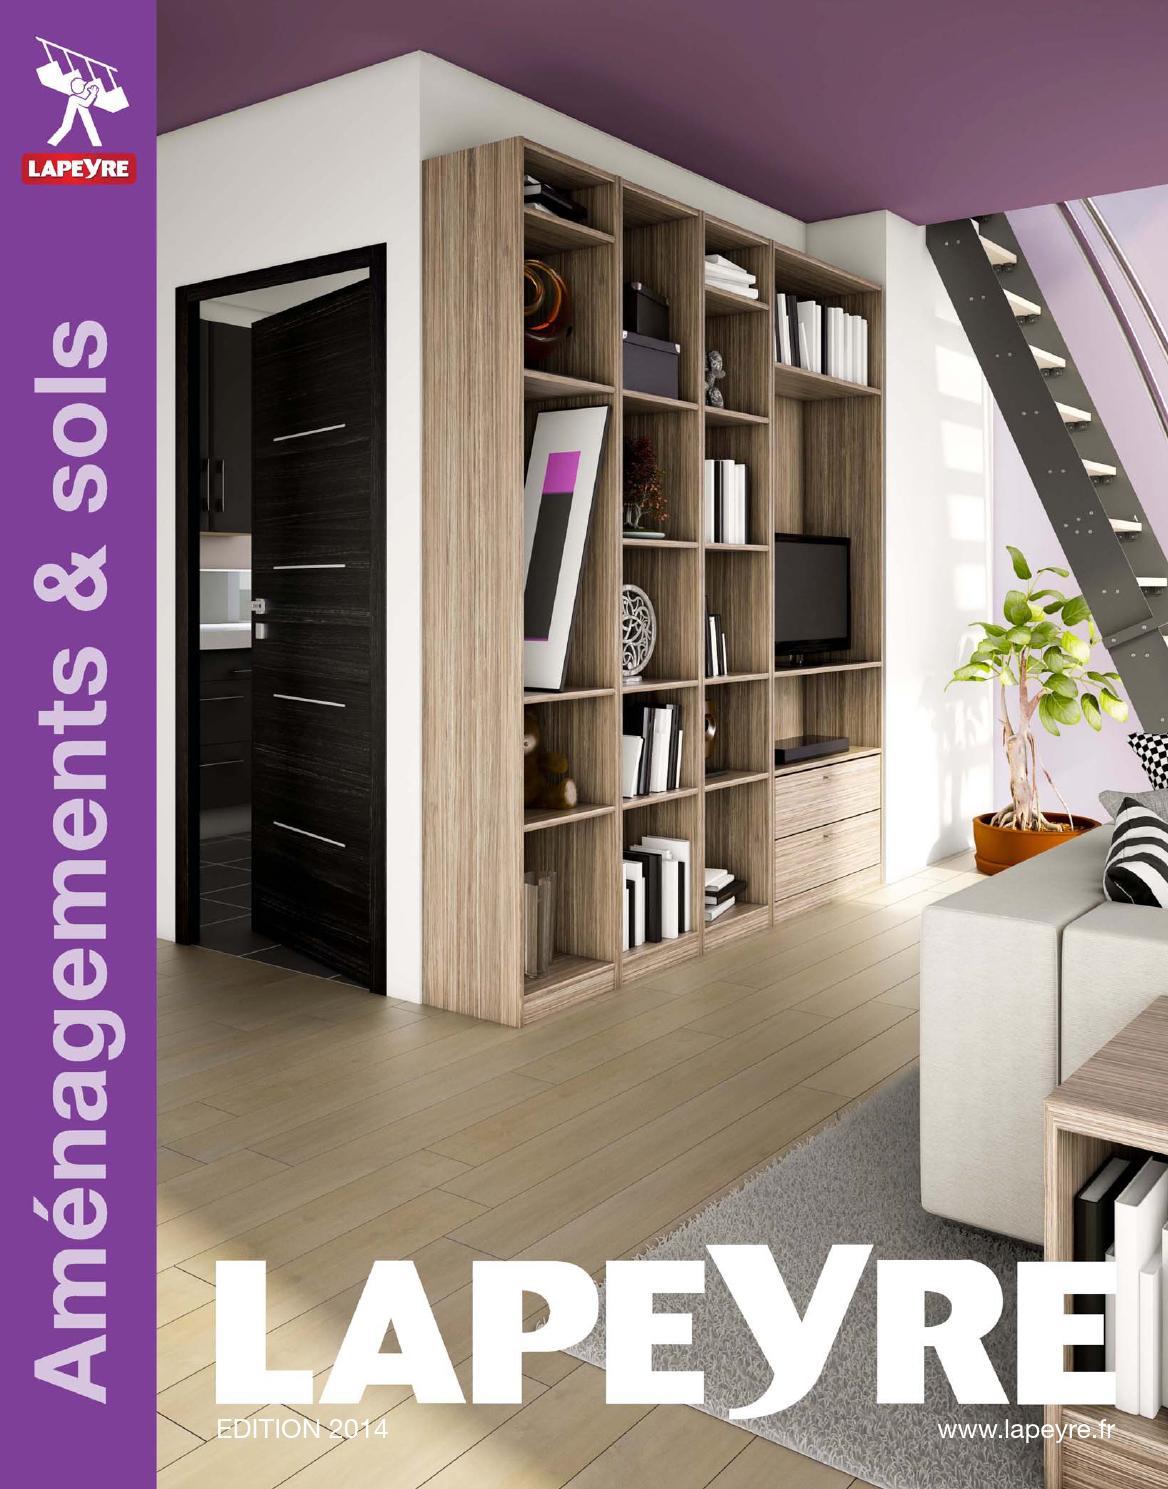 Catalogue Lapeyre Amenagements Sols 2014 By Joe Monroe Issuu